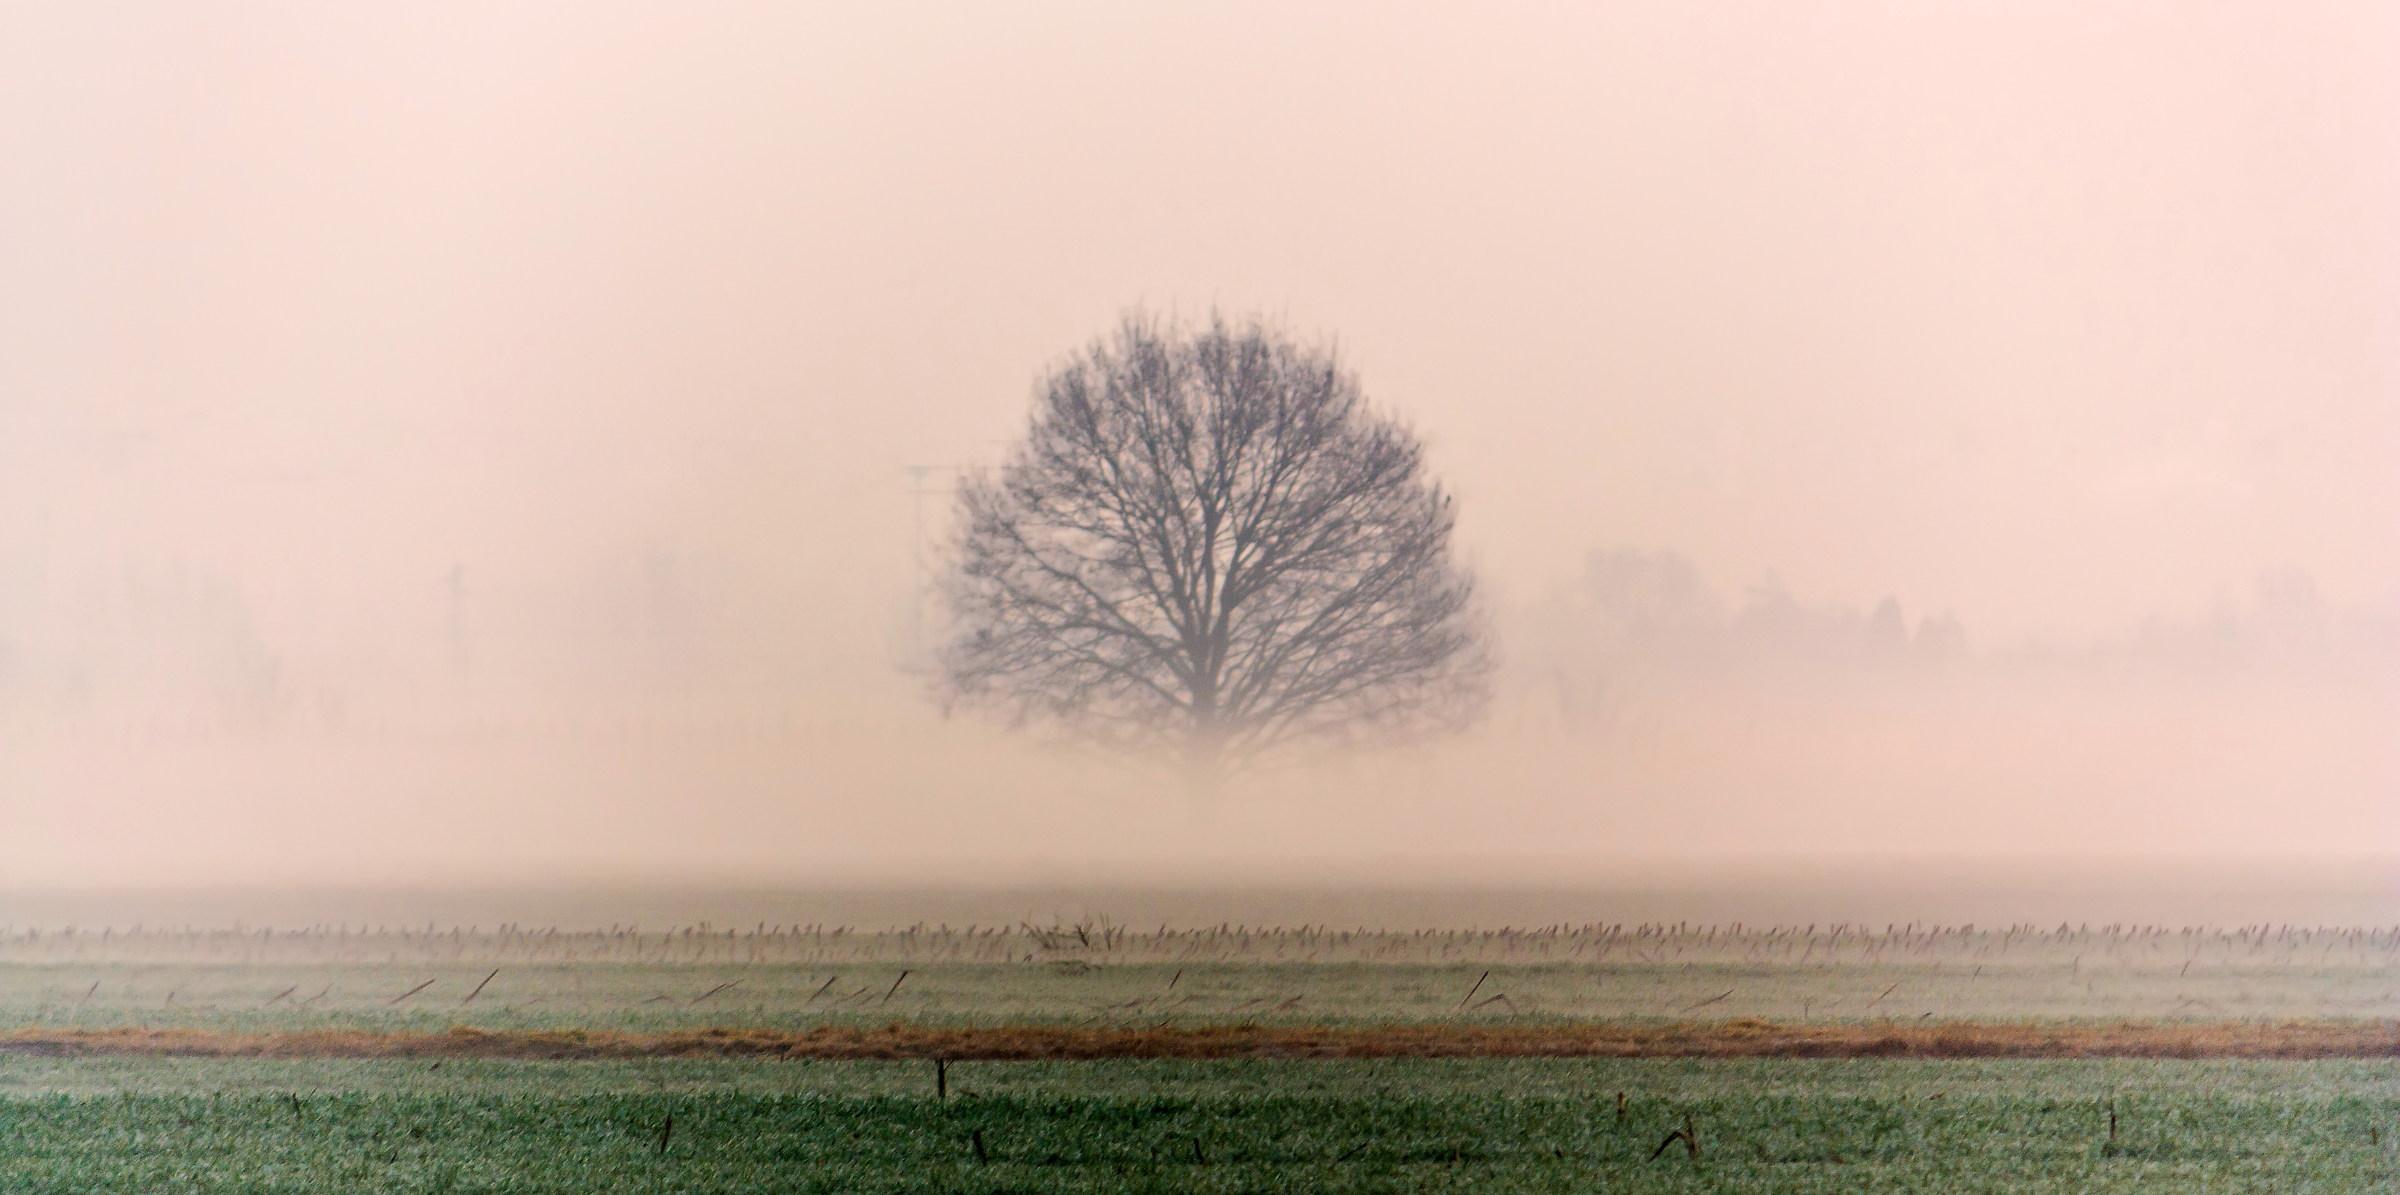 carpi - foggy day...